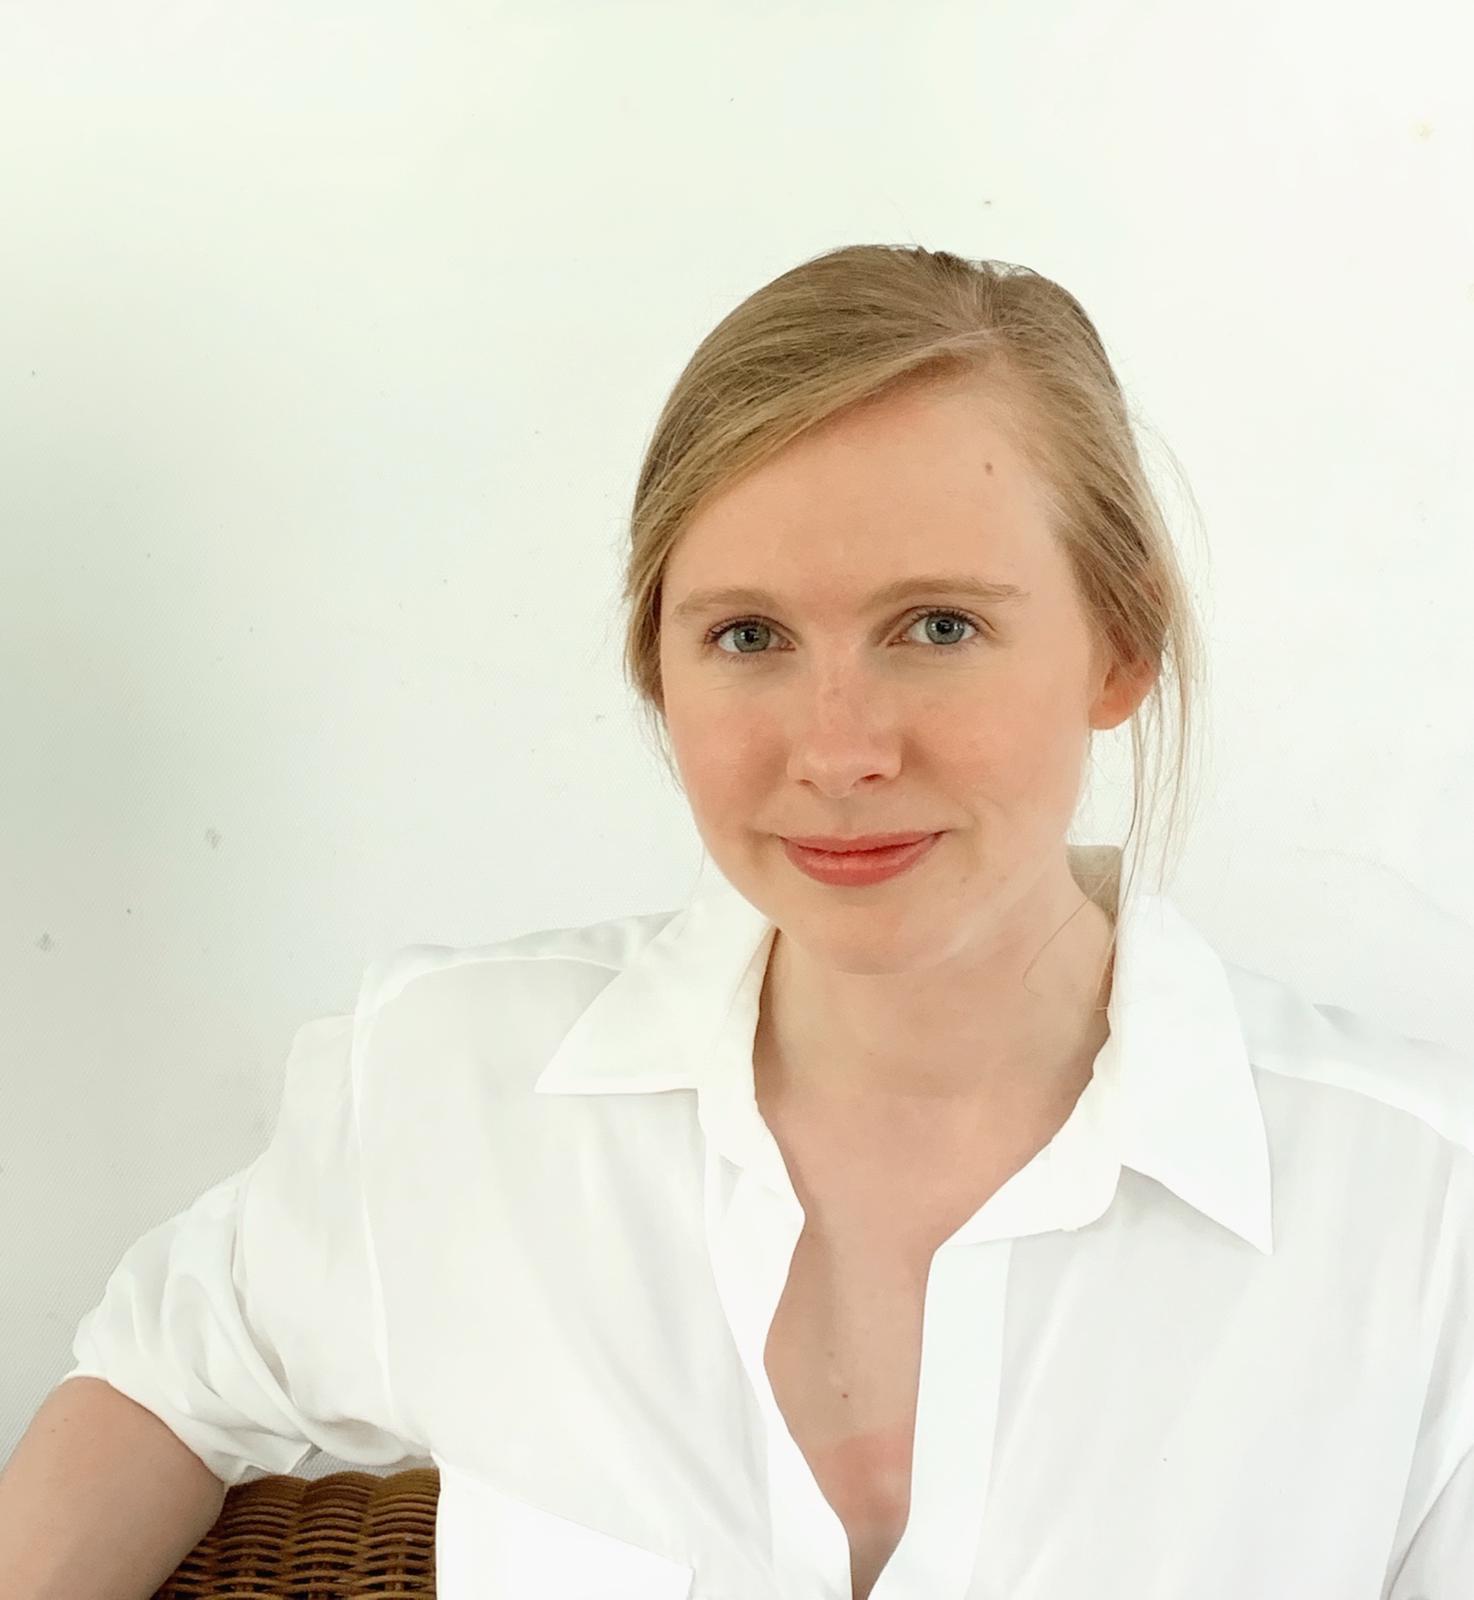 Teresa Hermosilla is a member of Berkeley Global Society